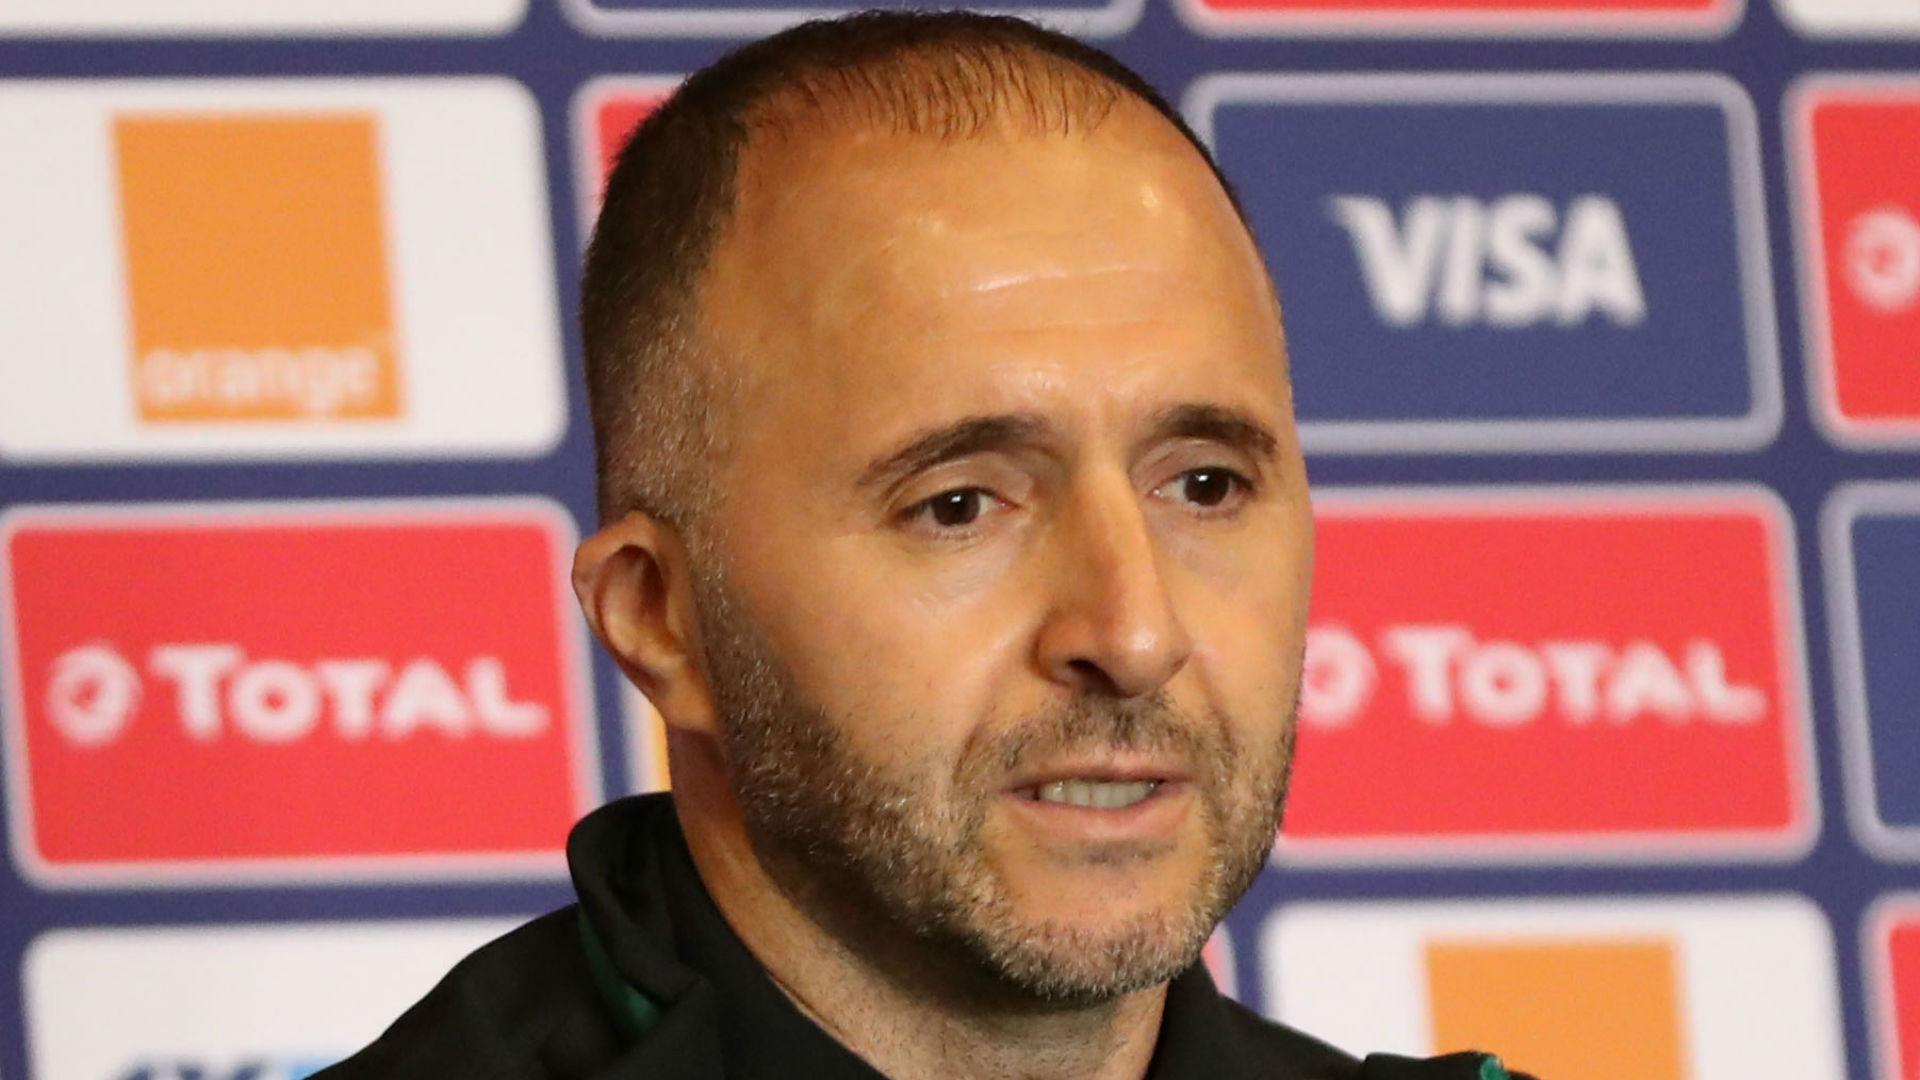 Afcon 2019: Algeria on course to achieve set objectives in Egypt - Djamel Belmadi